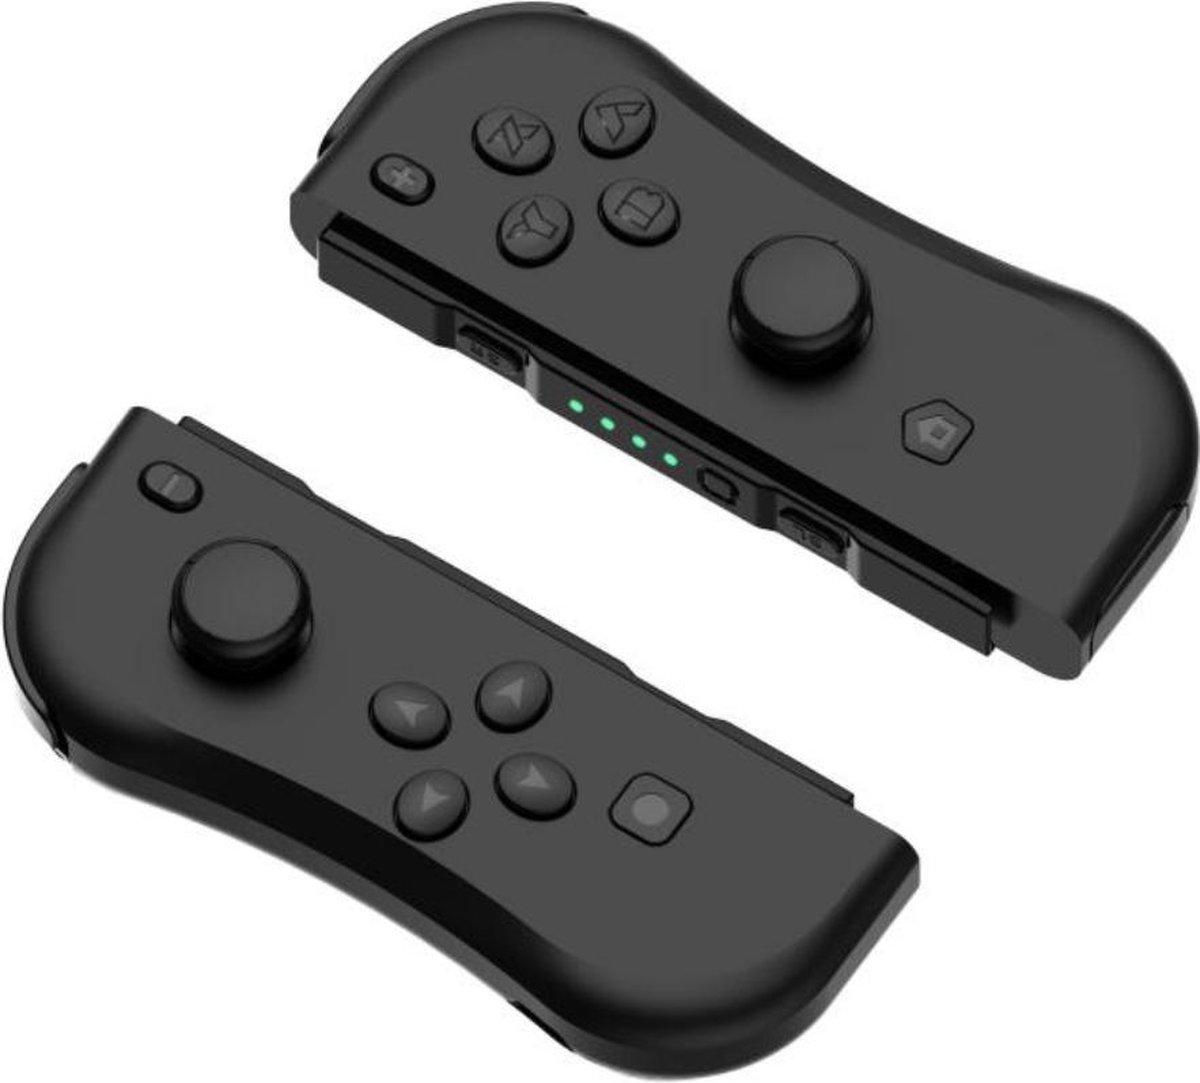 Honcam Joy-Con controller -  Joy-Con controller - Used for Nintendo switch - Controllers